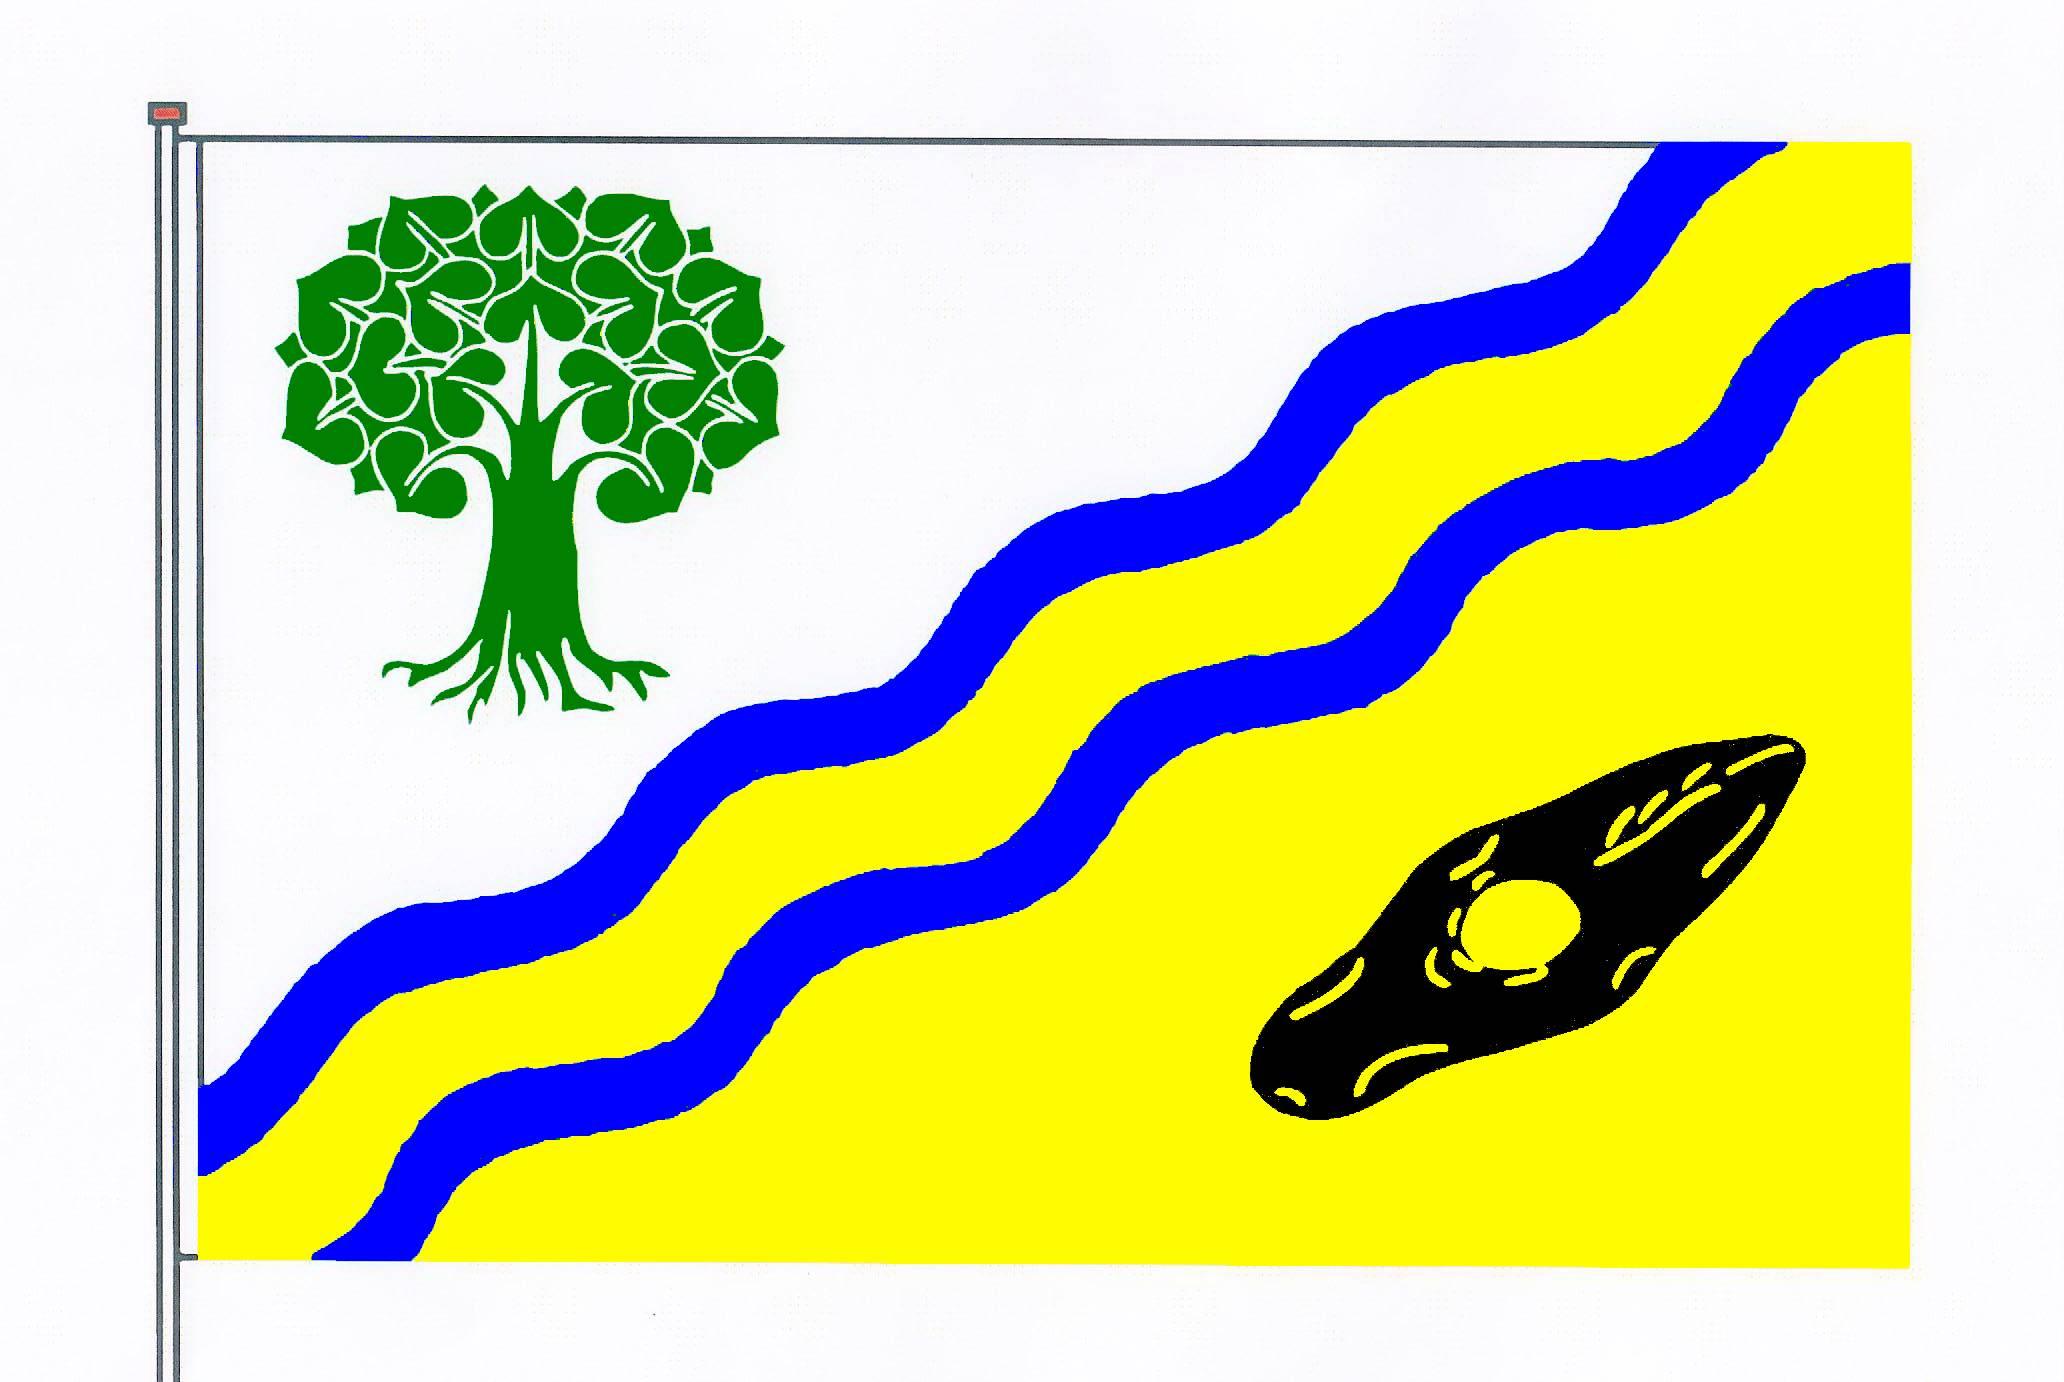 Flagge GemeindeSollwitt, Kreis Nordfriesland